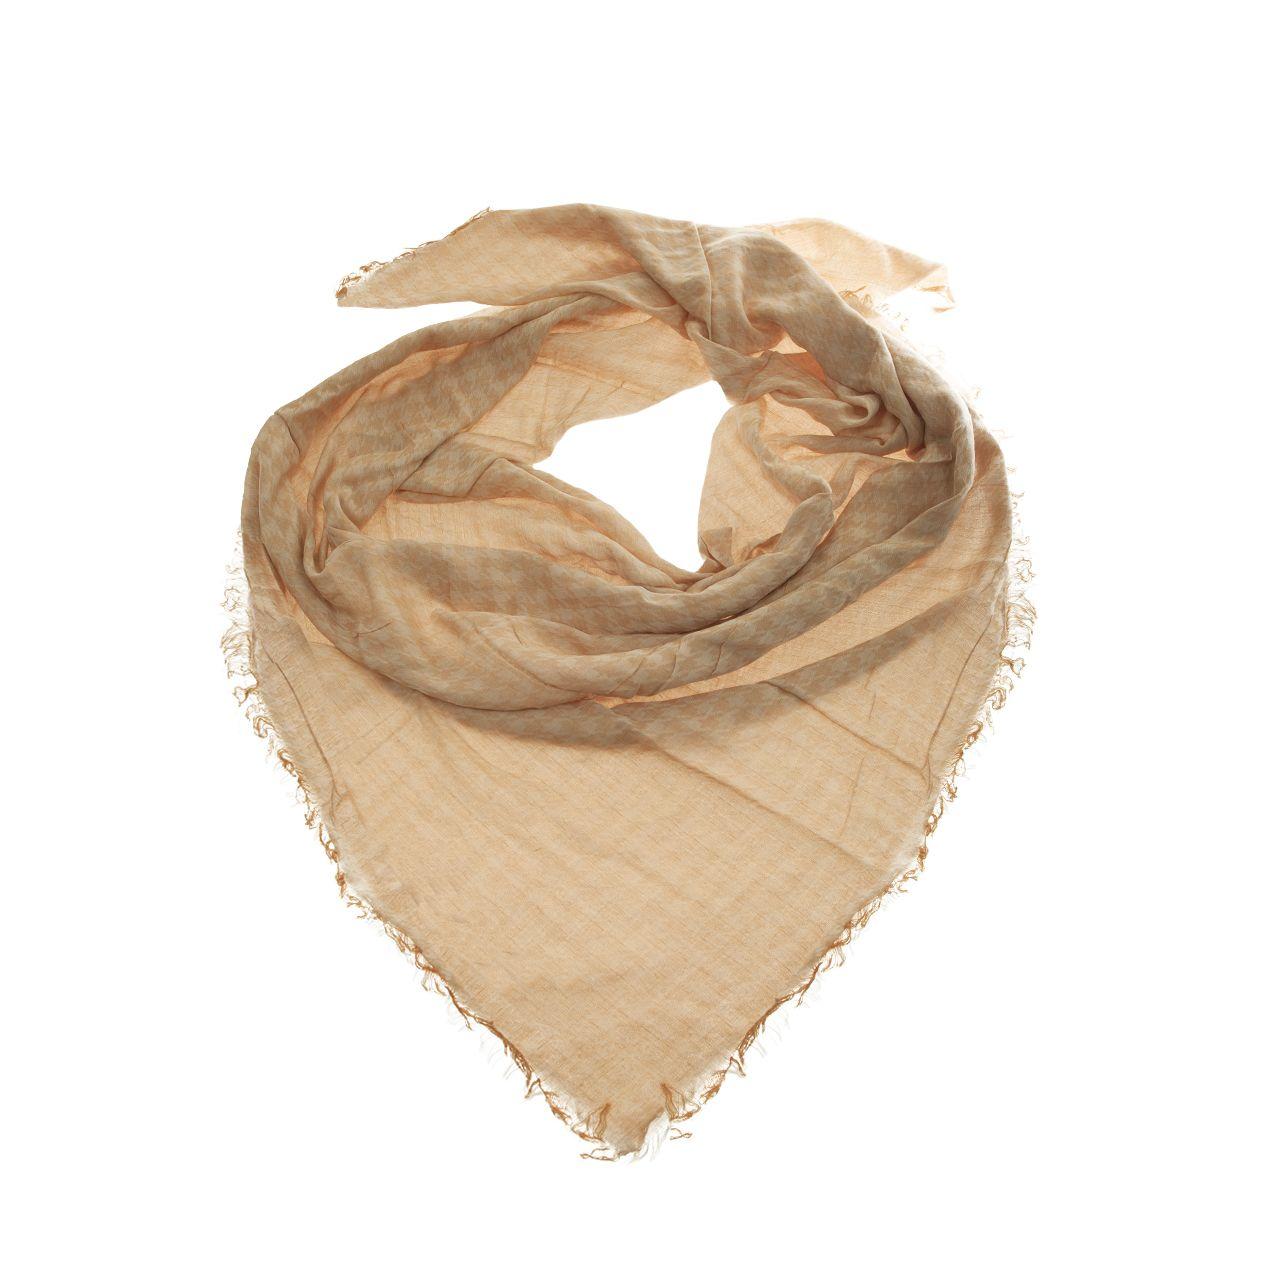 روسری زنانه کد 273 -  - 2